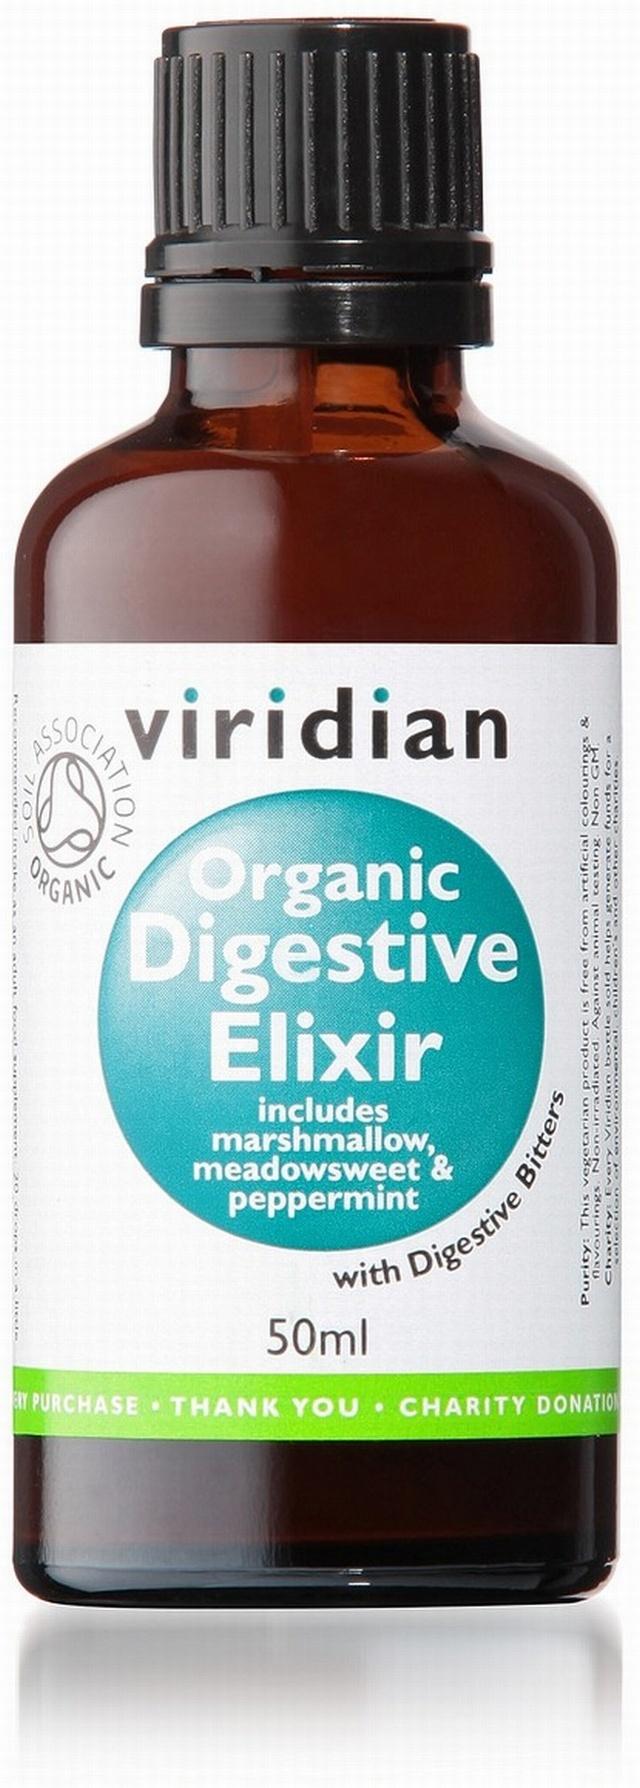 Viridian Organic Digestive Elixir 50ml